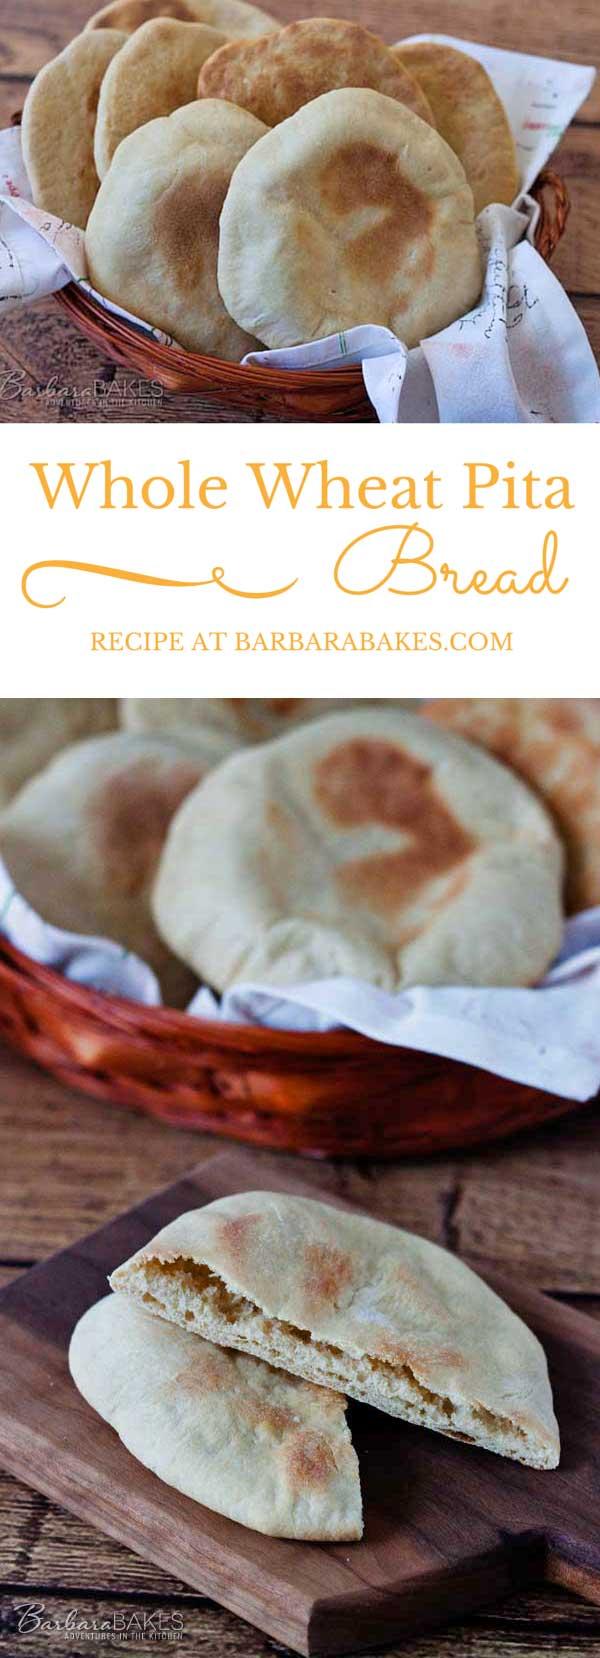 Whole-Wheat-Pita-Bread-Collage-Barbara-Bakes